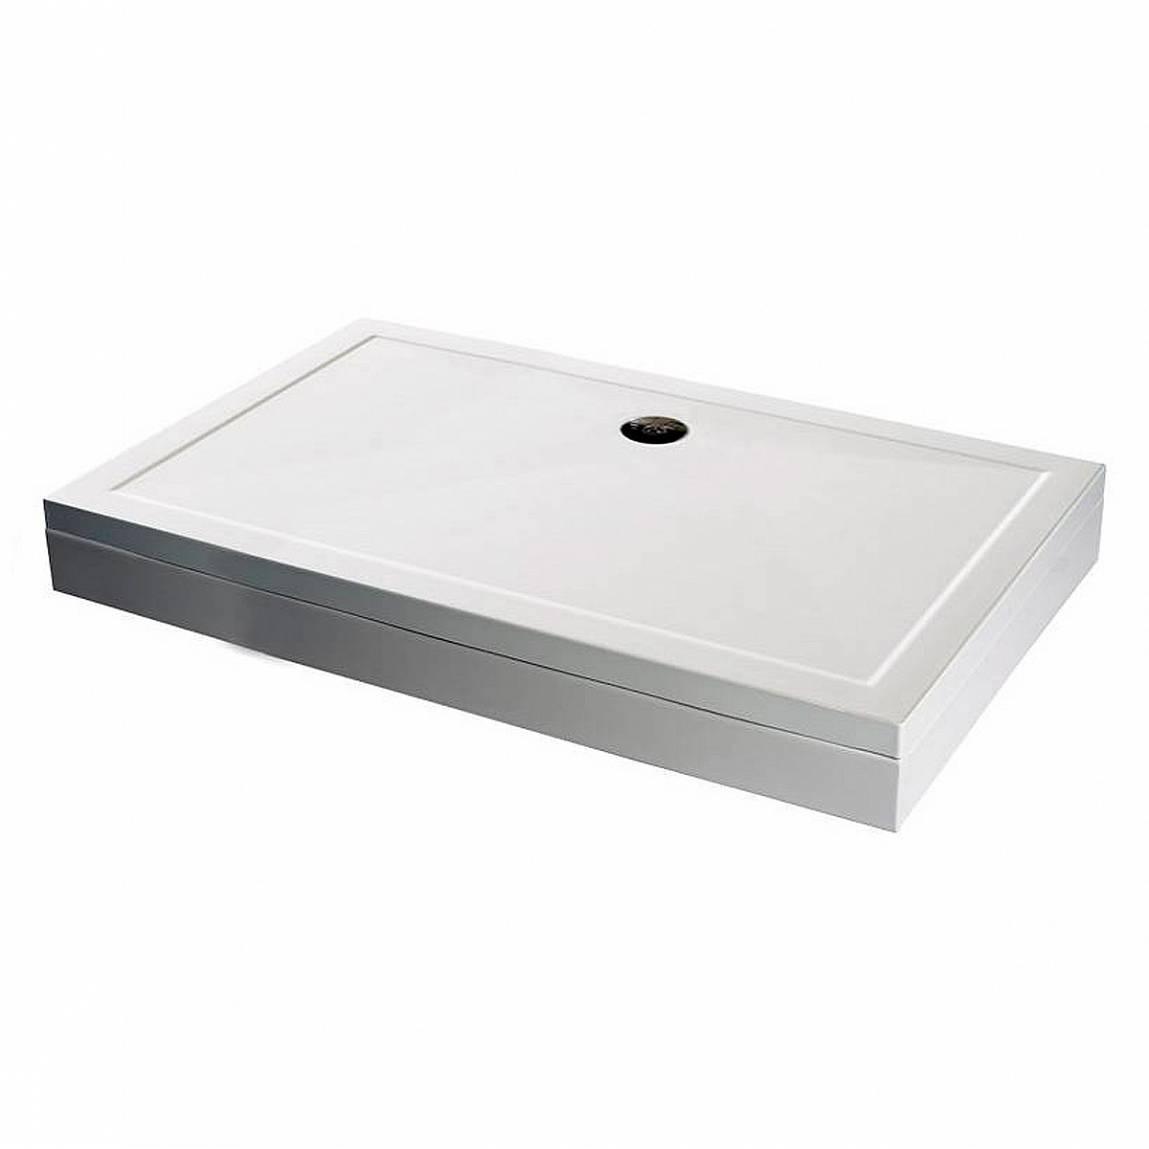 Image of Rectangular Stone Shower Tray & Riser Kit 1200 x 800